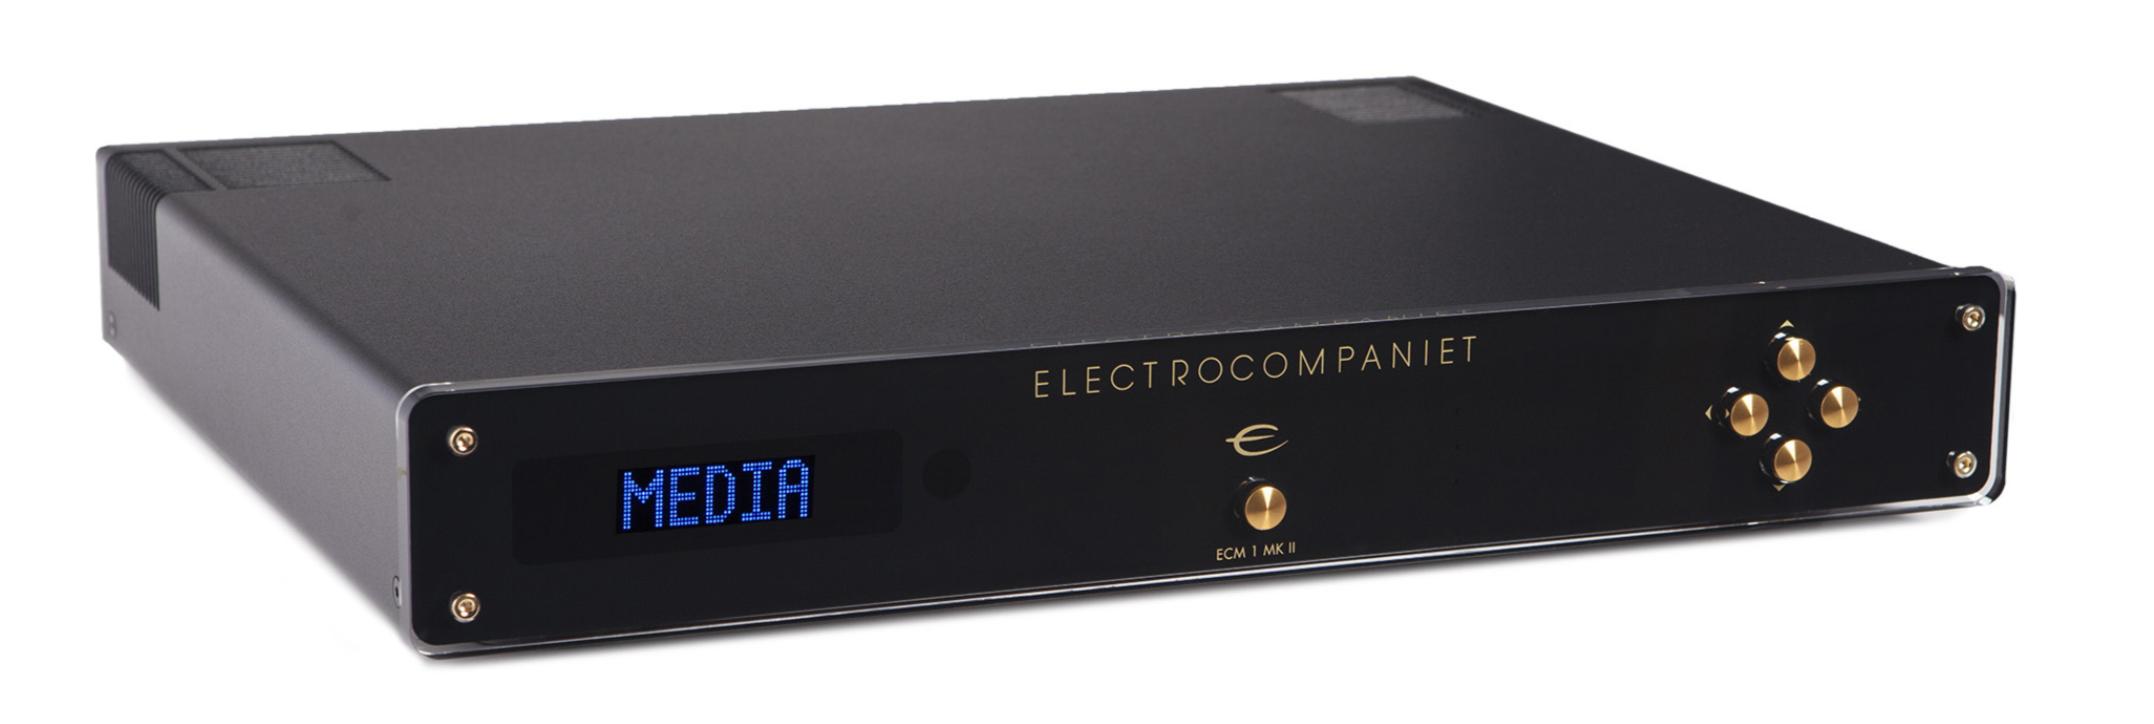 Electrocompaniet 1 MKII Music Player